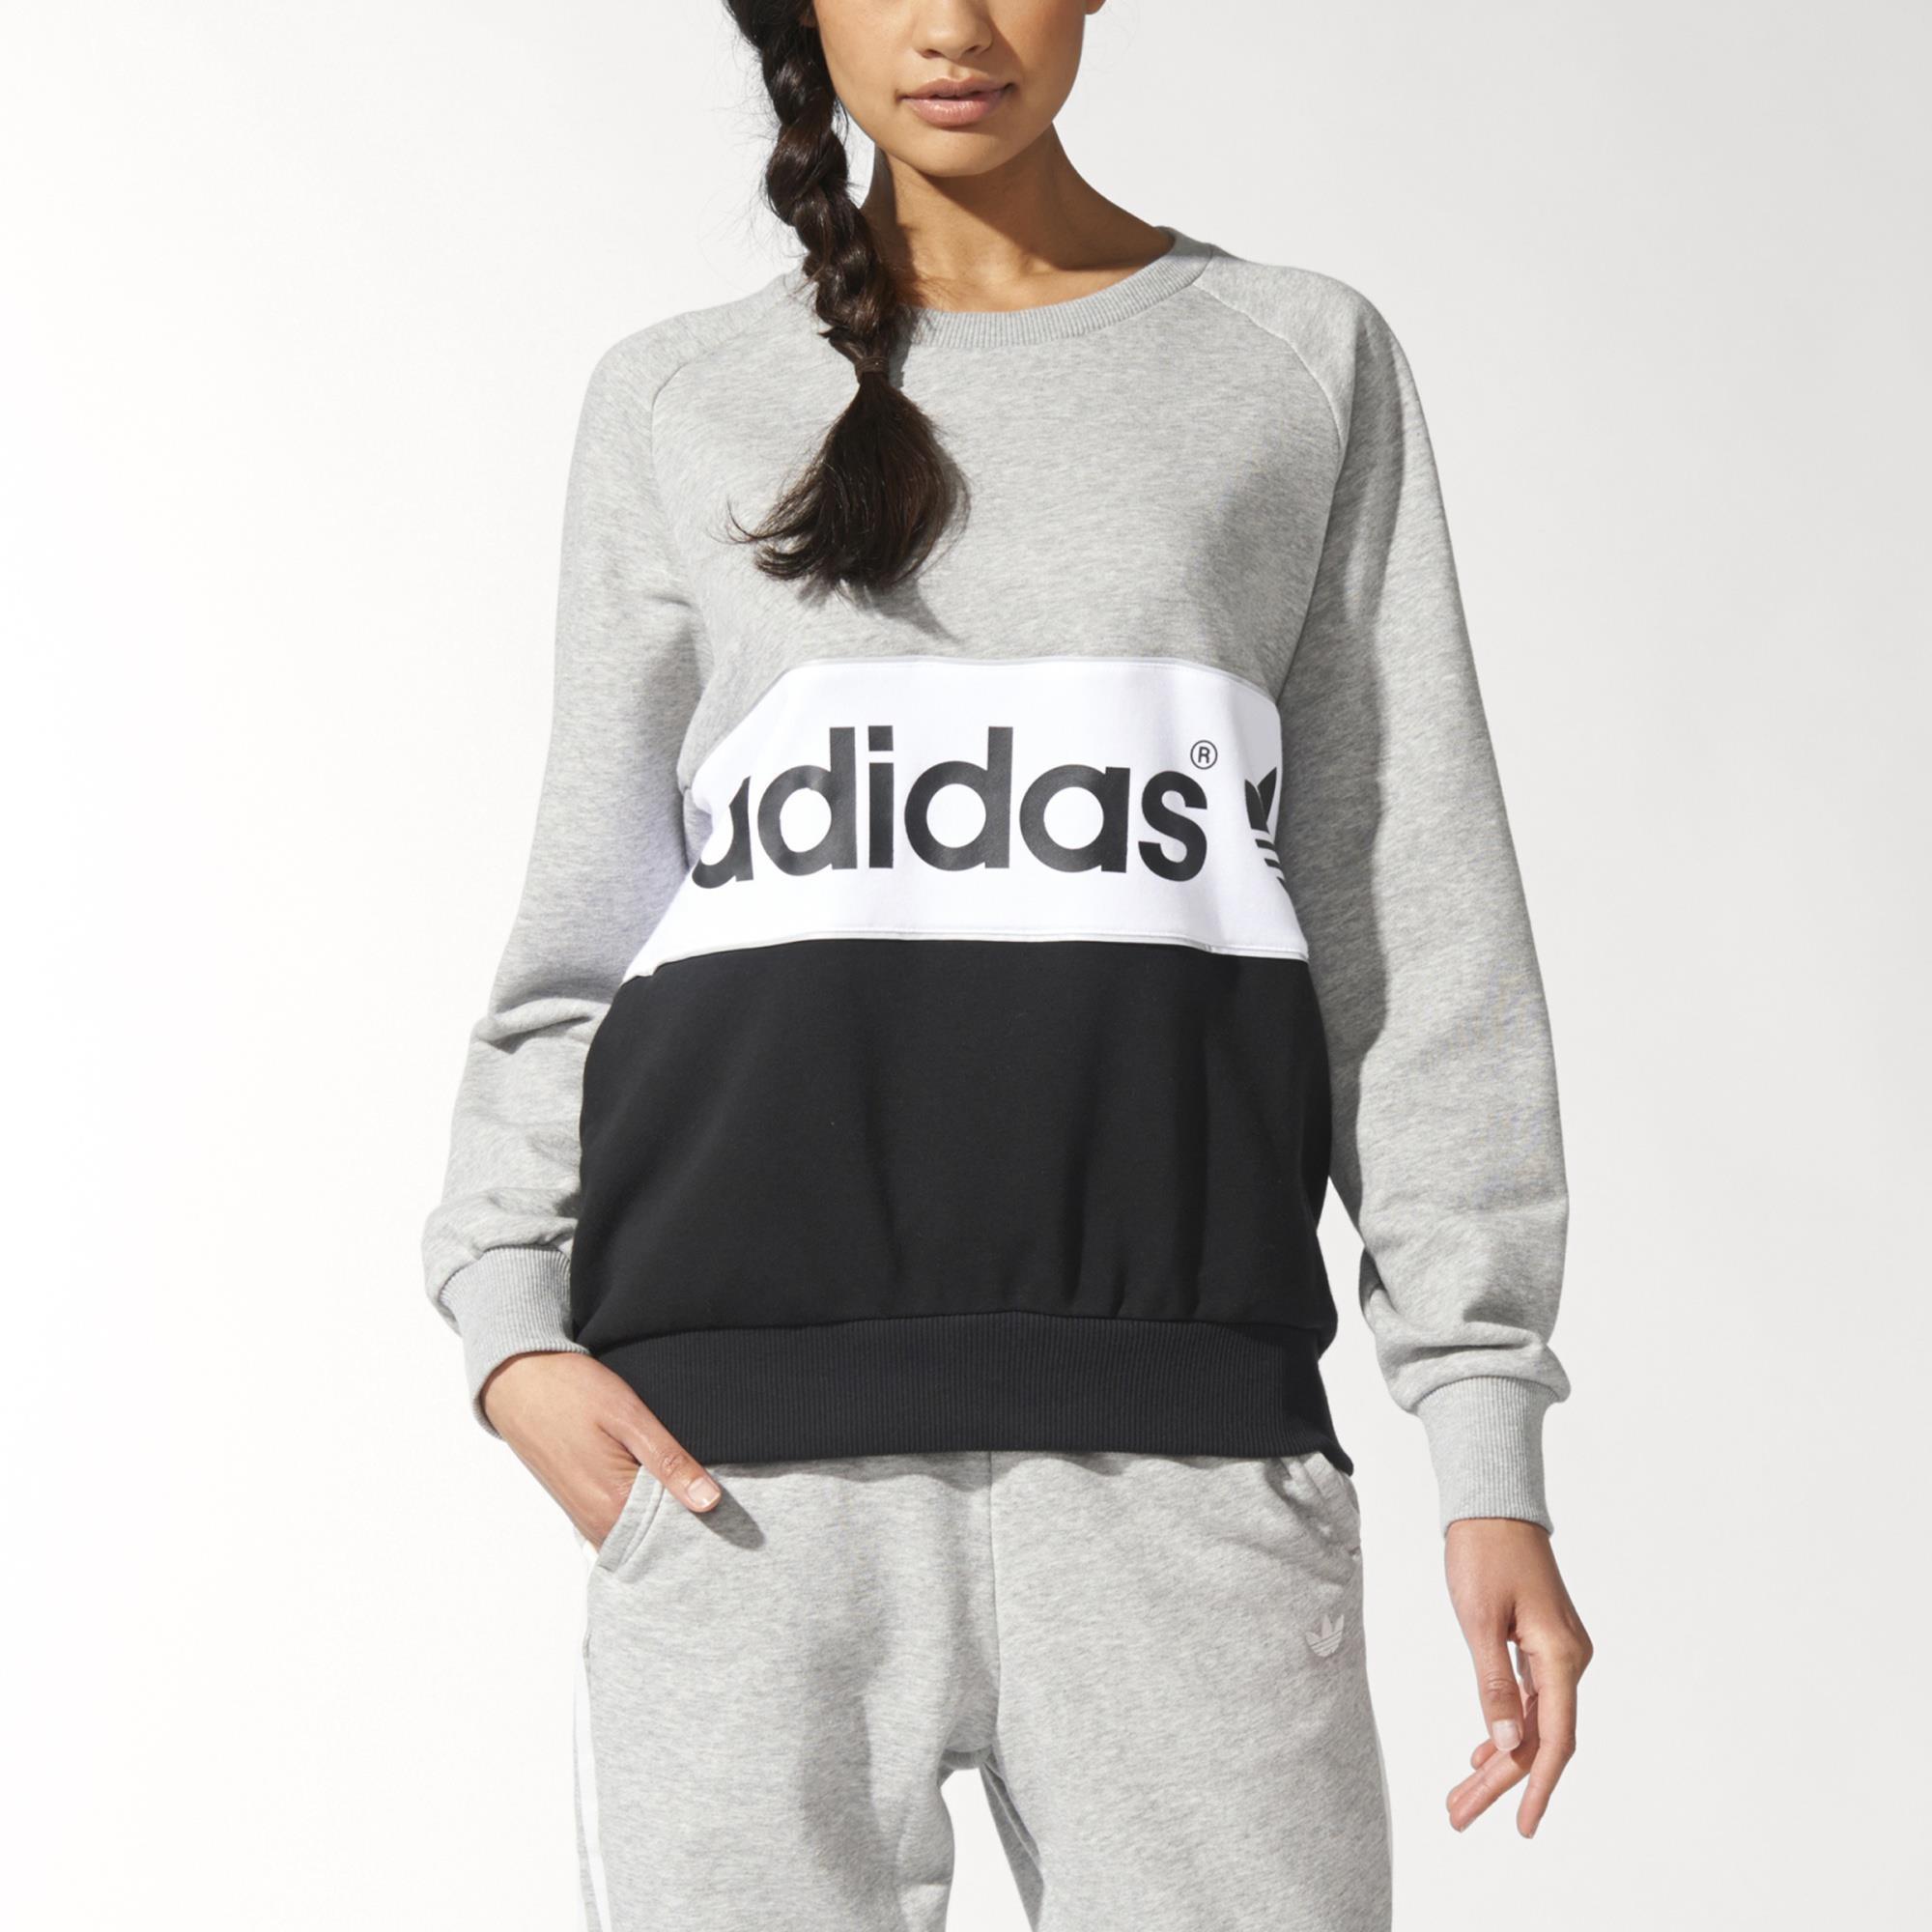 adidas City Tokyo Sweatshirt - Grey  f9876b683f5c